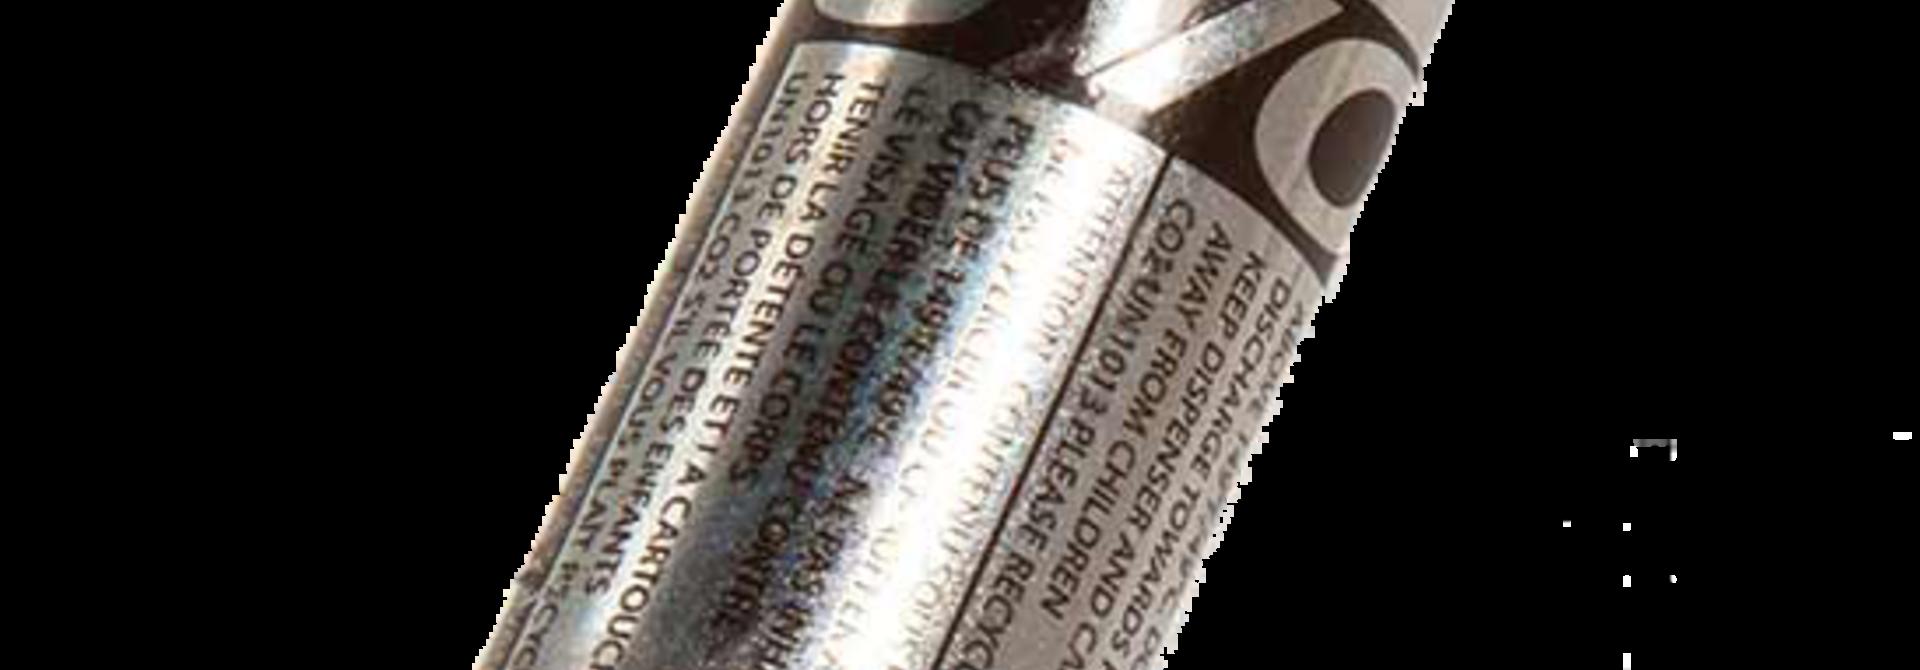 EVO, Threaded 20g CO2 Cartridges